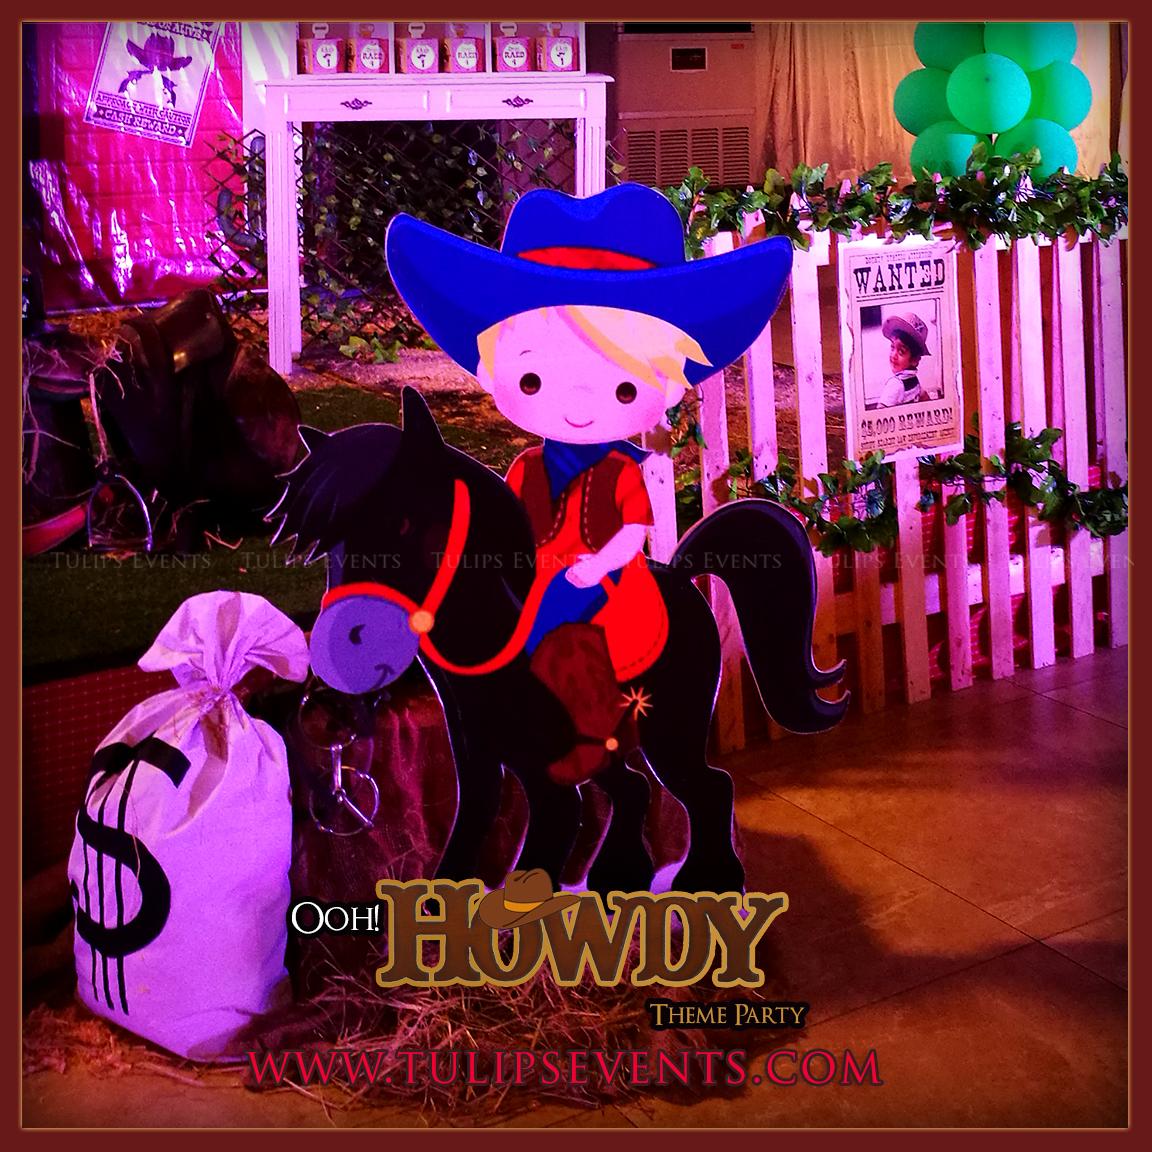 little-cowboy-howdy-party-theme-decoration-ideas-in-pakistan-28